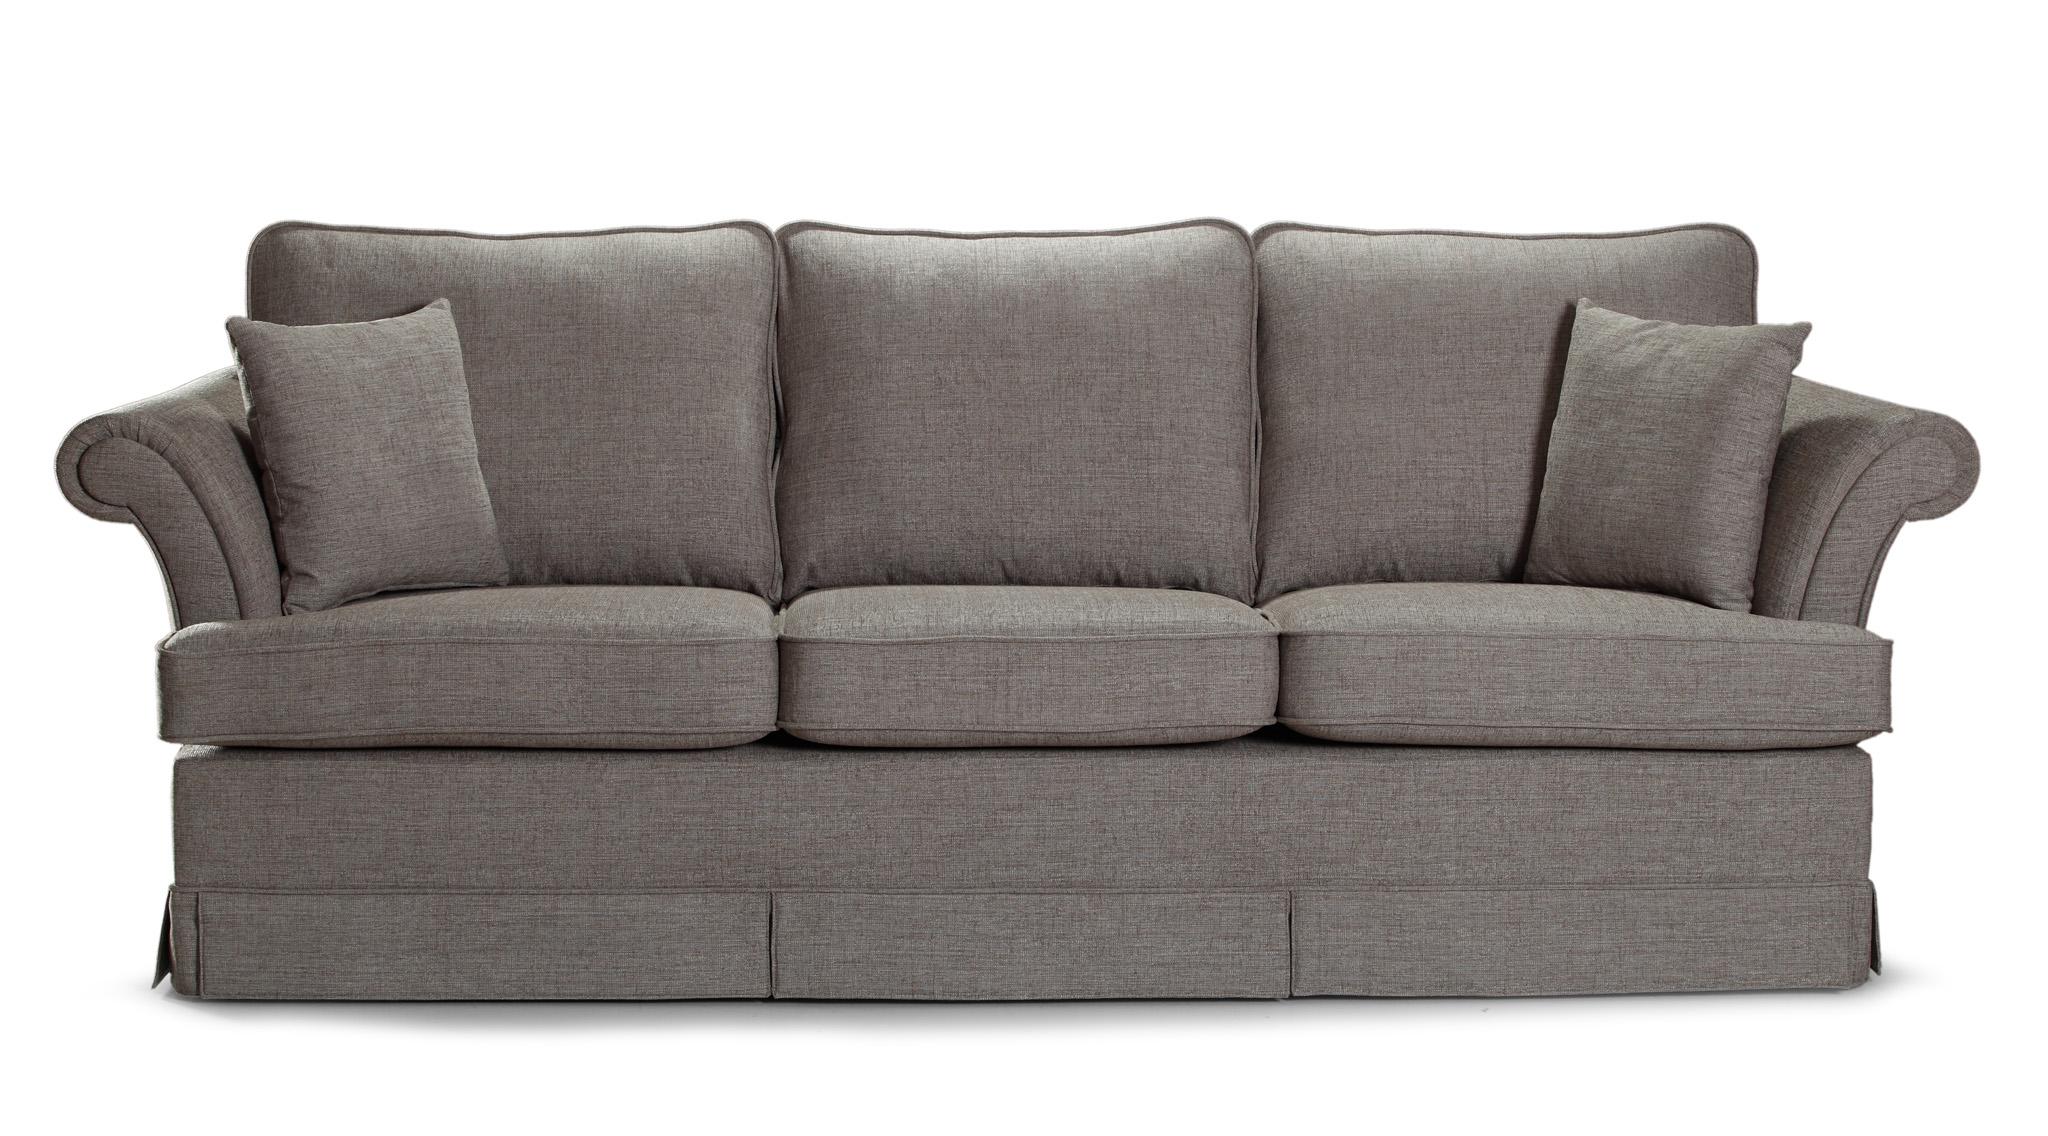 Canapea fixa 3 locuri tapitata cu stofa Afrodyta